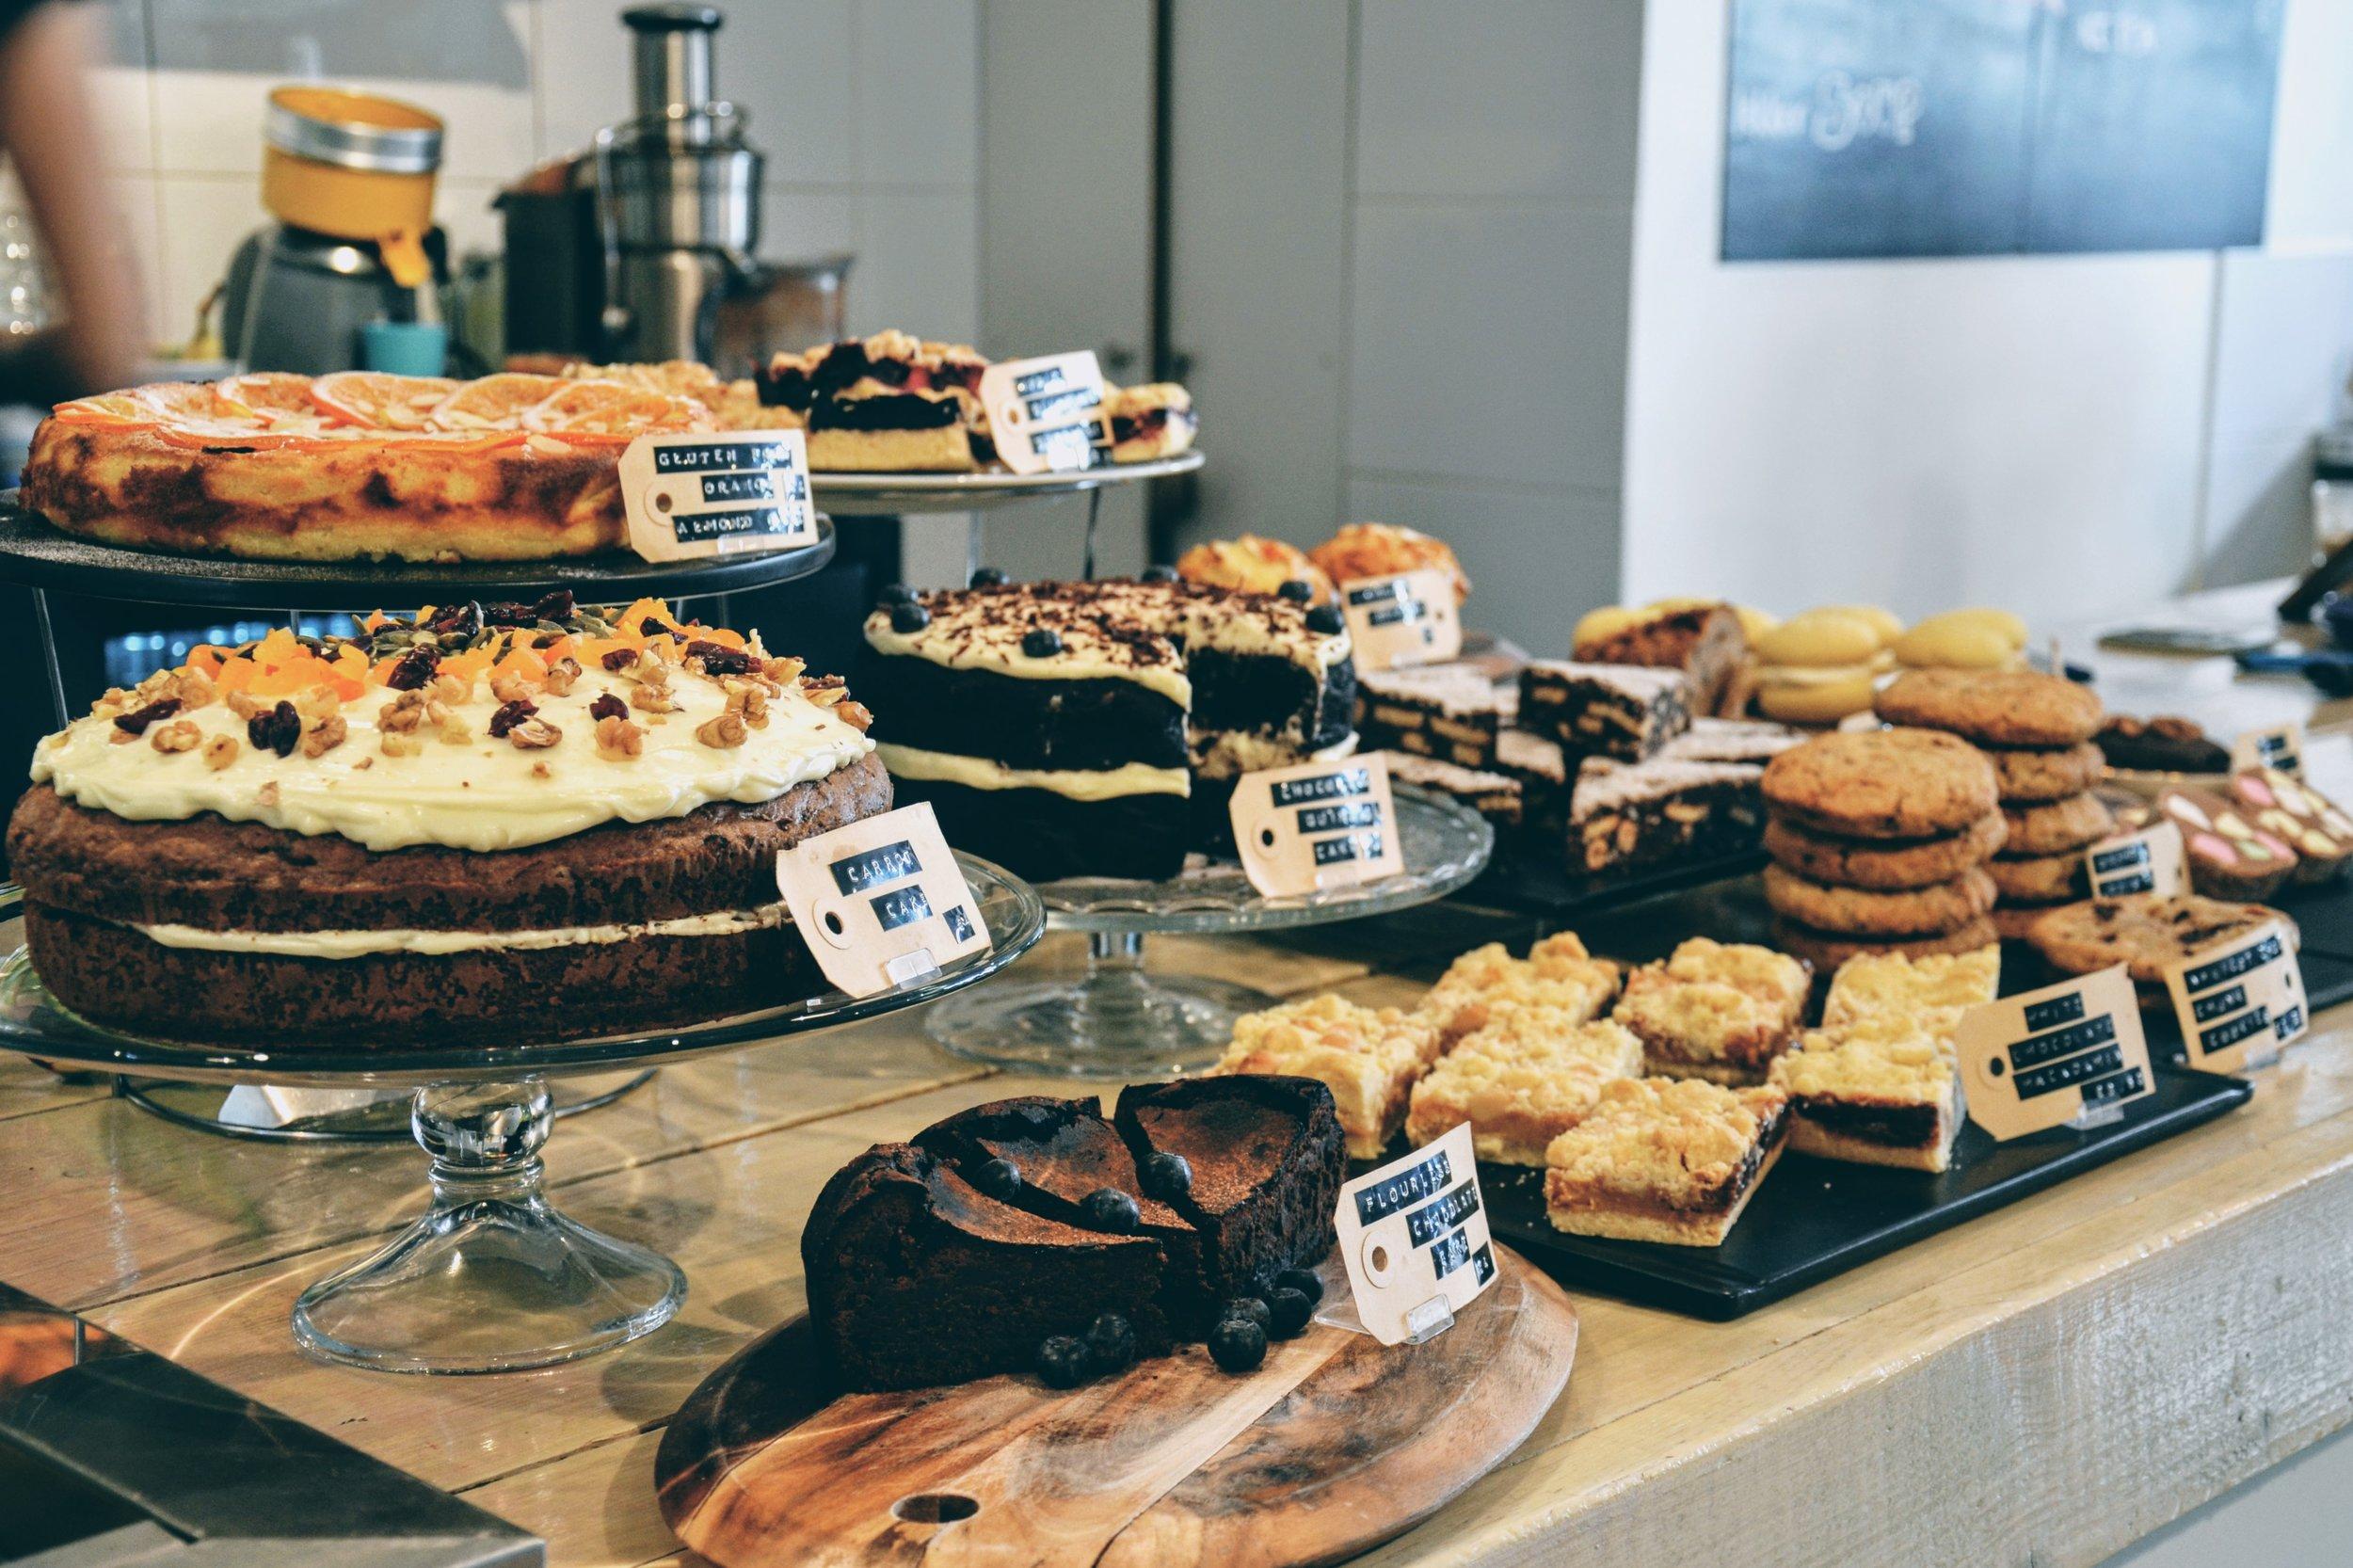 Plentiful breakfast options at Bakers & Roasters